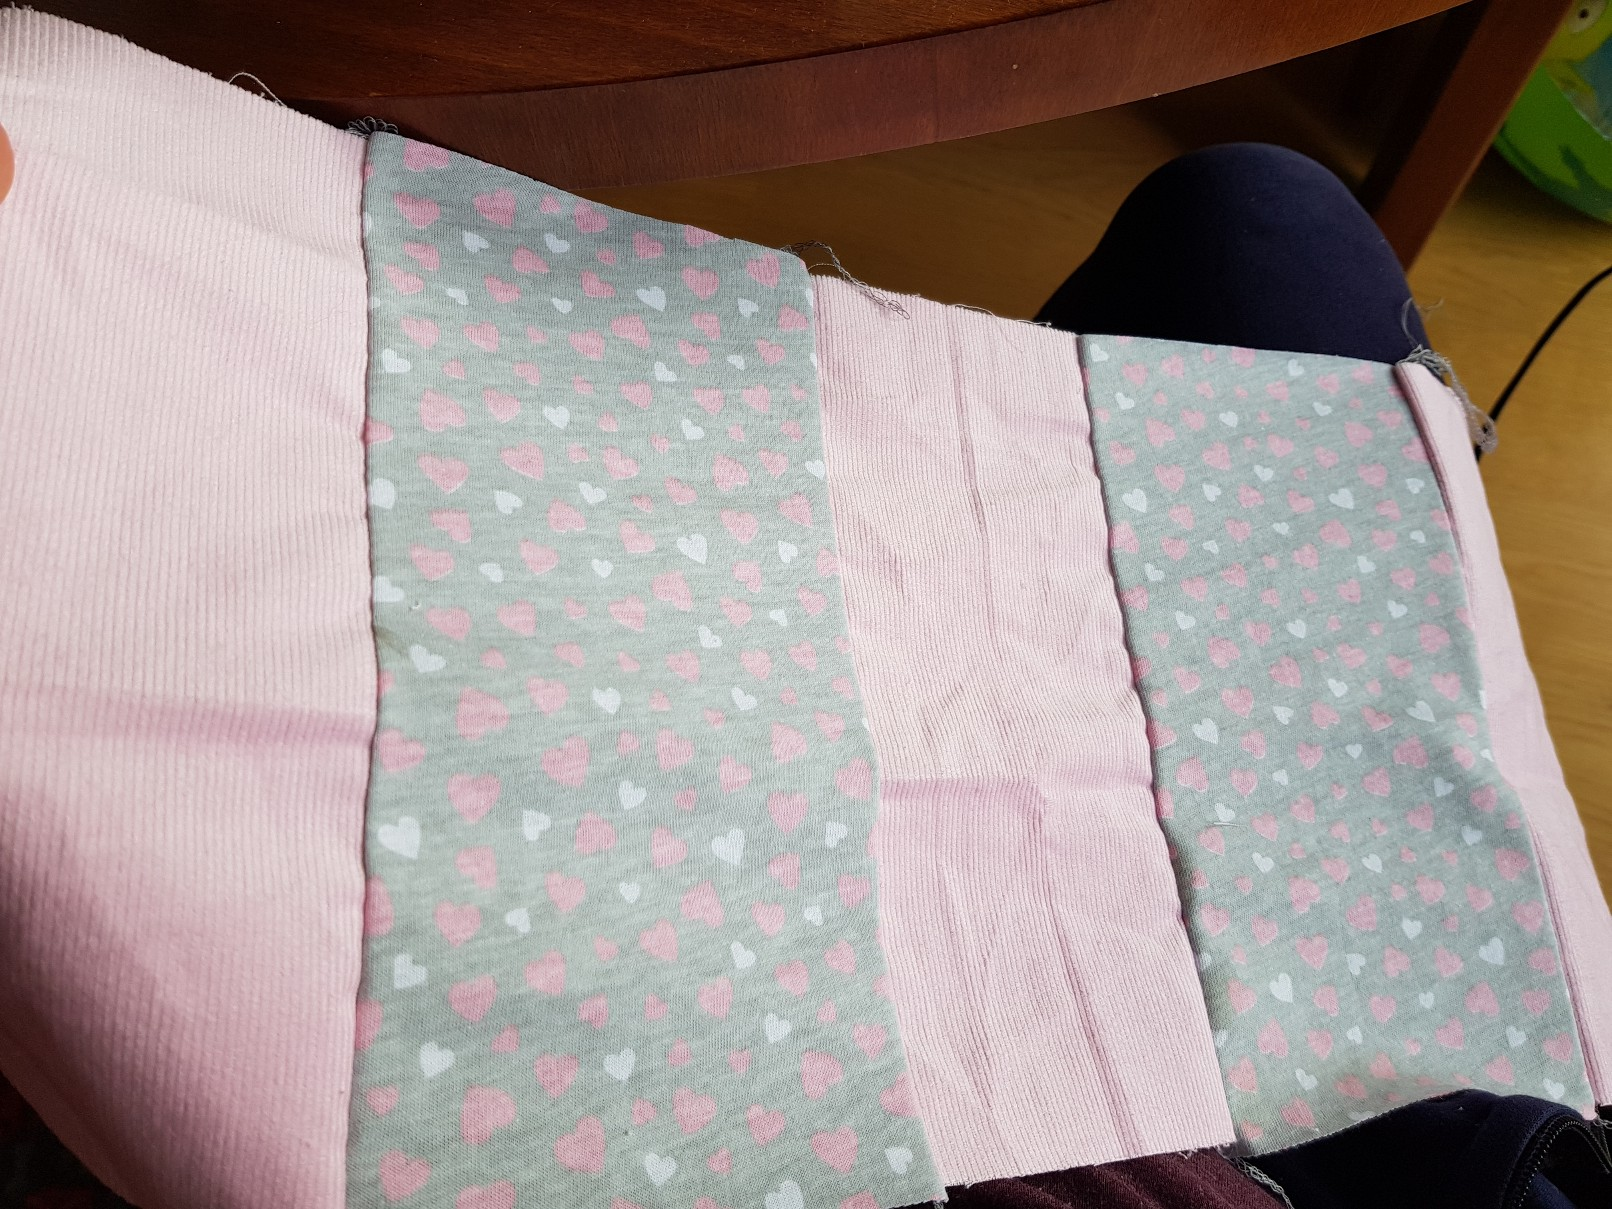 corduroy skirt pleats stripes